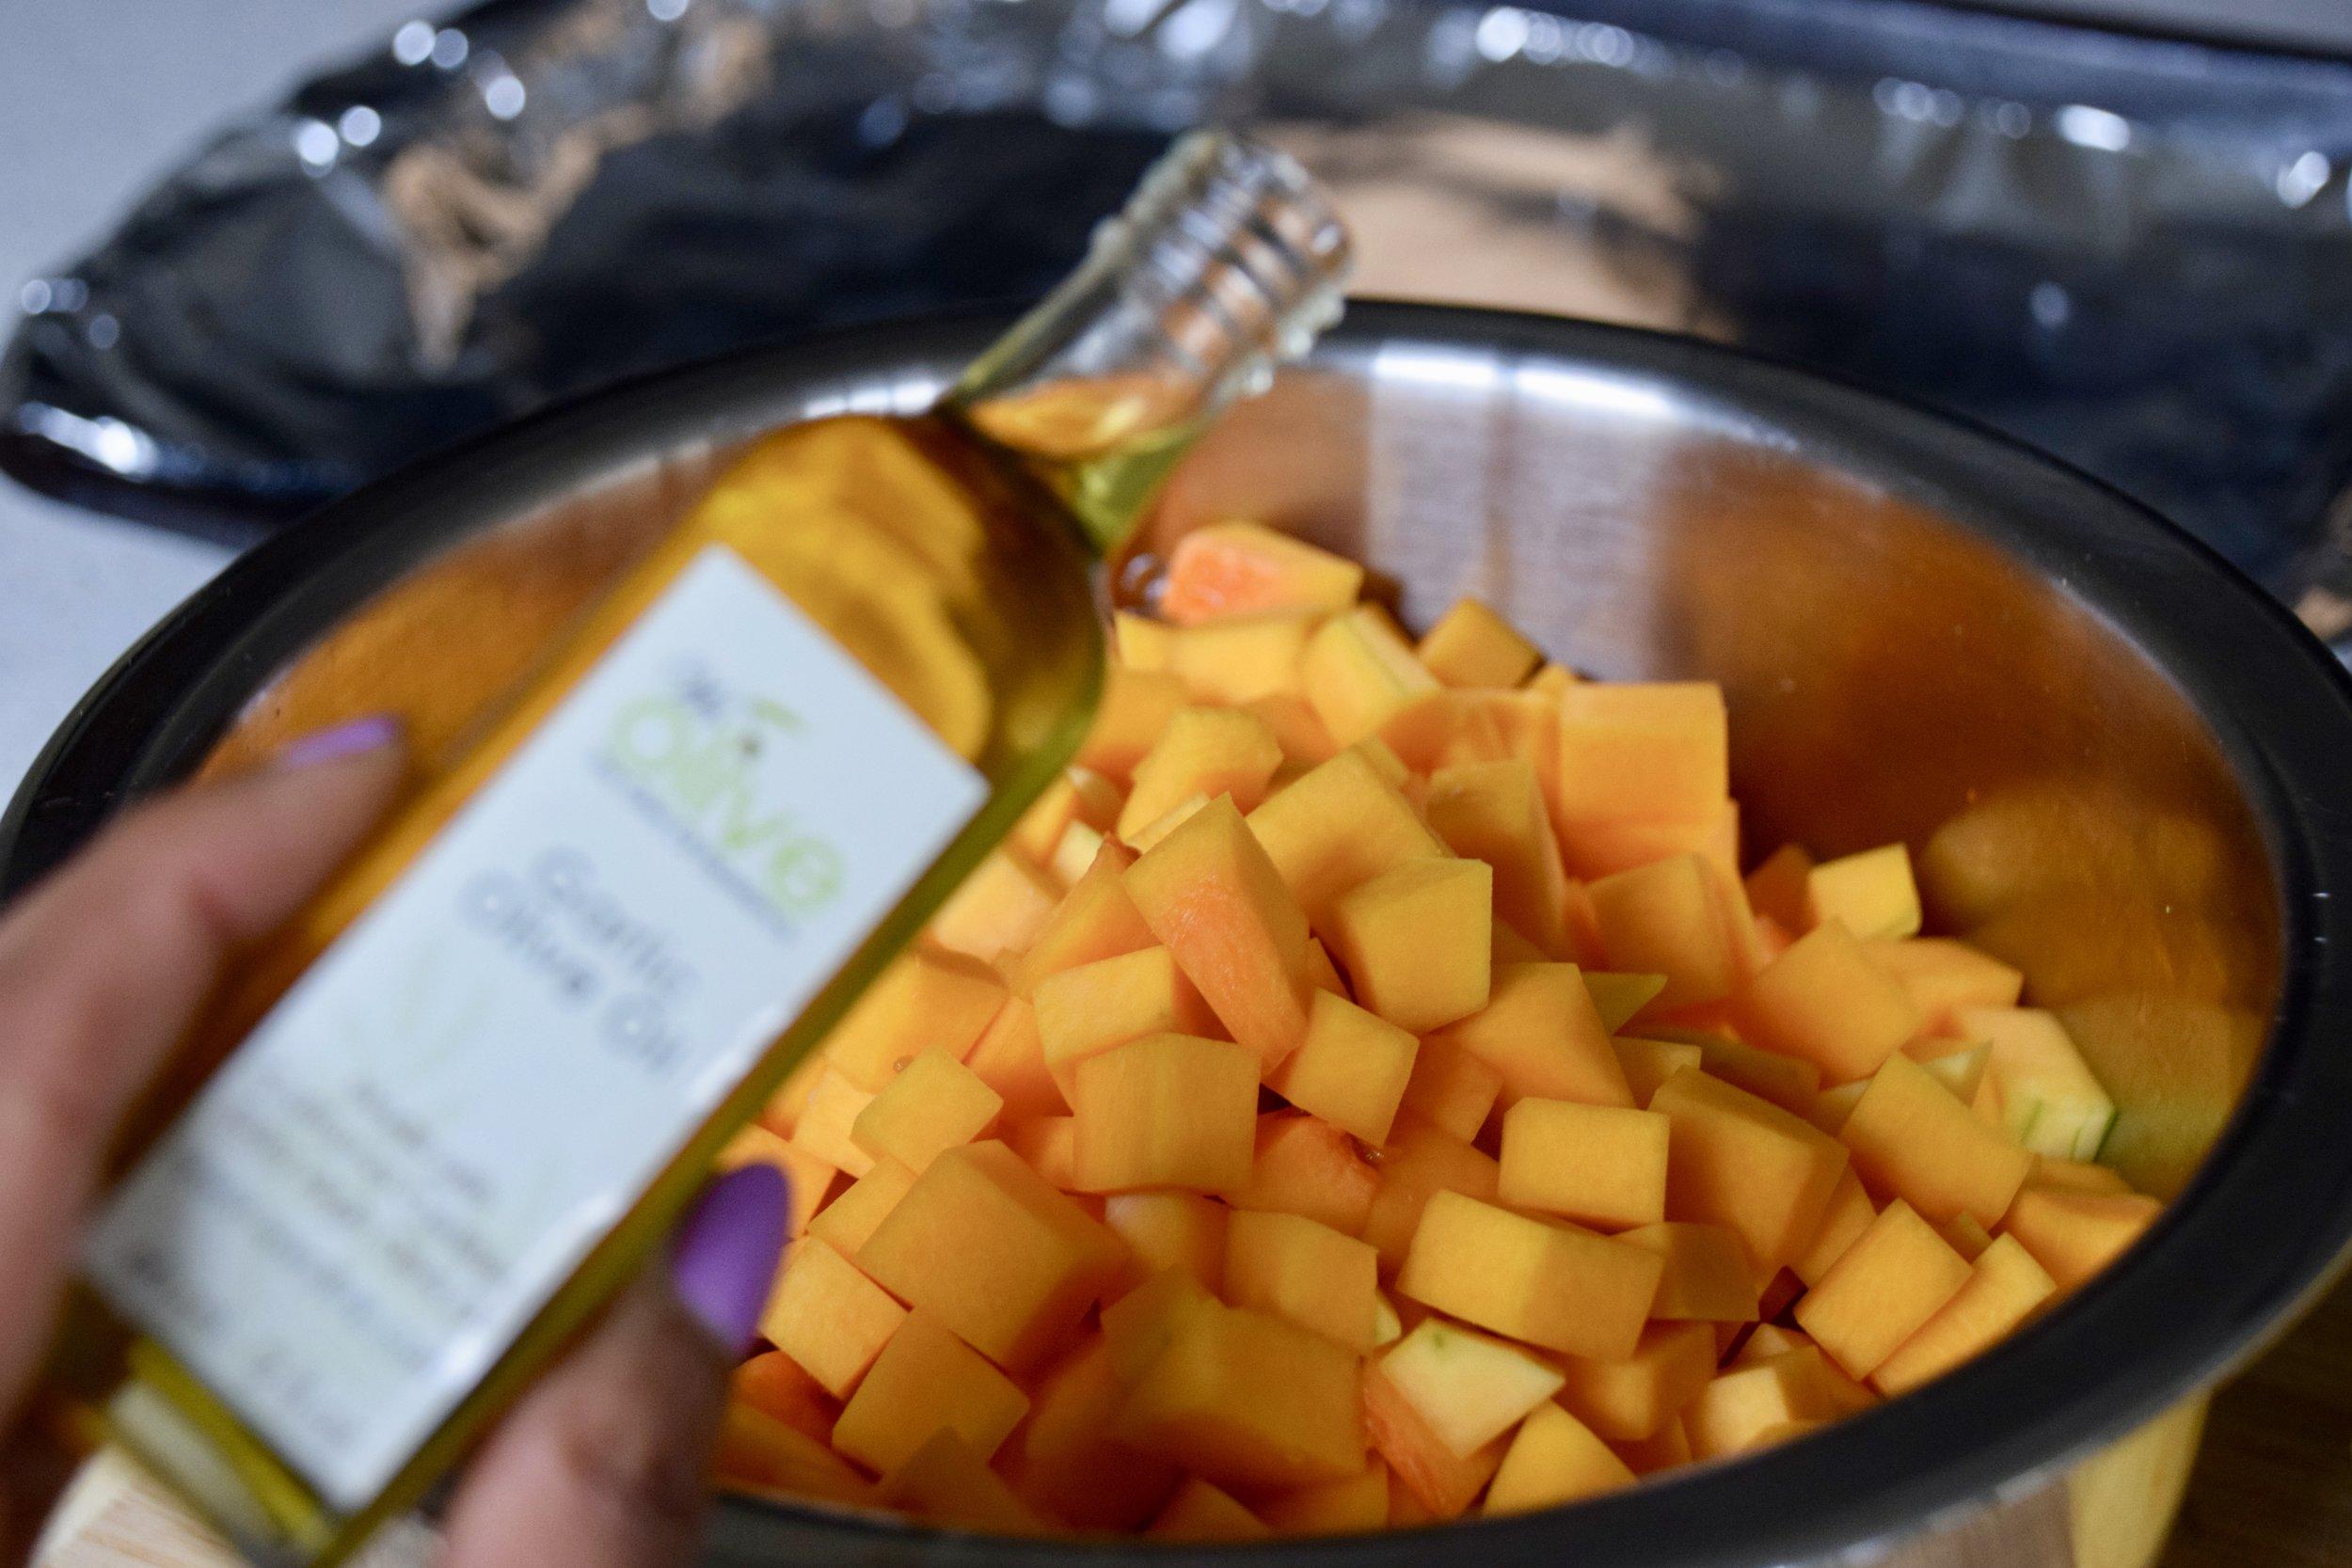 Olive Oil Butternut Squash.jpeg